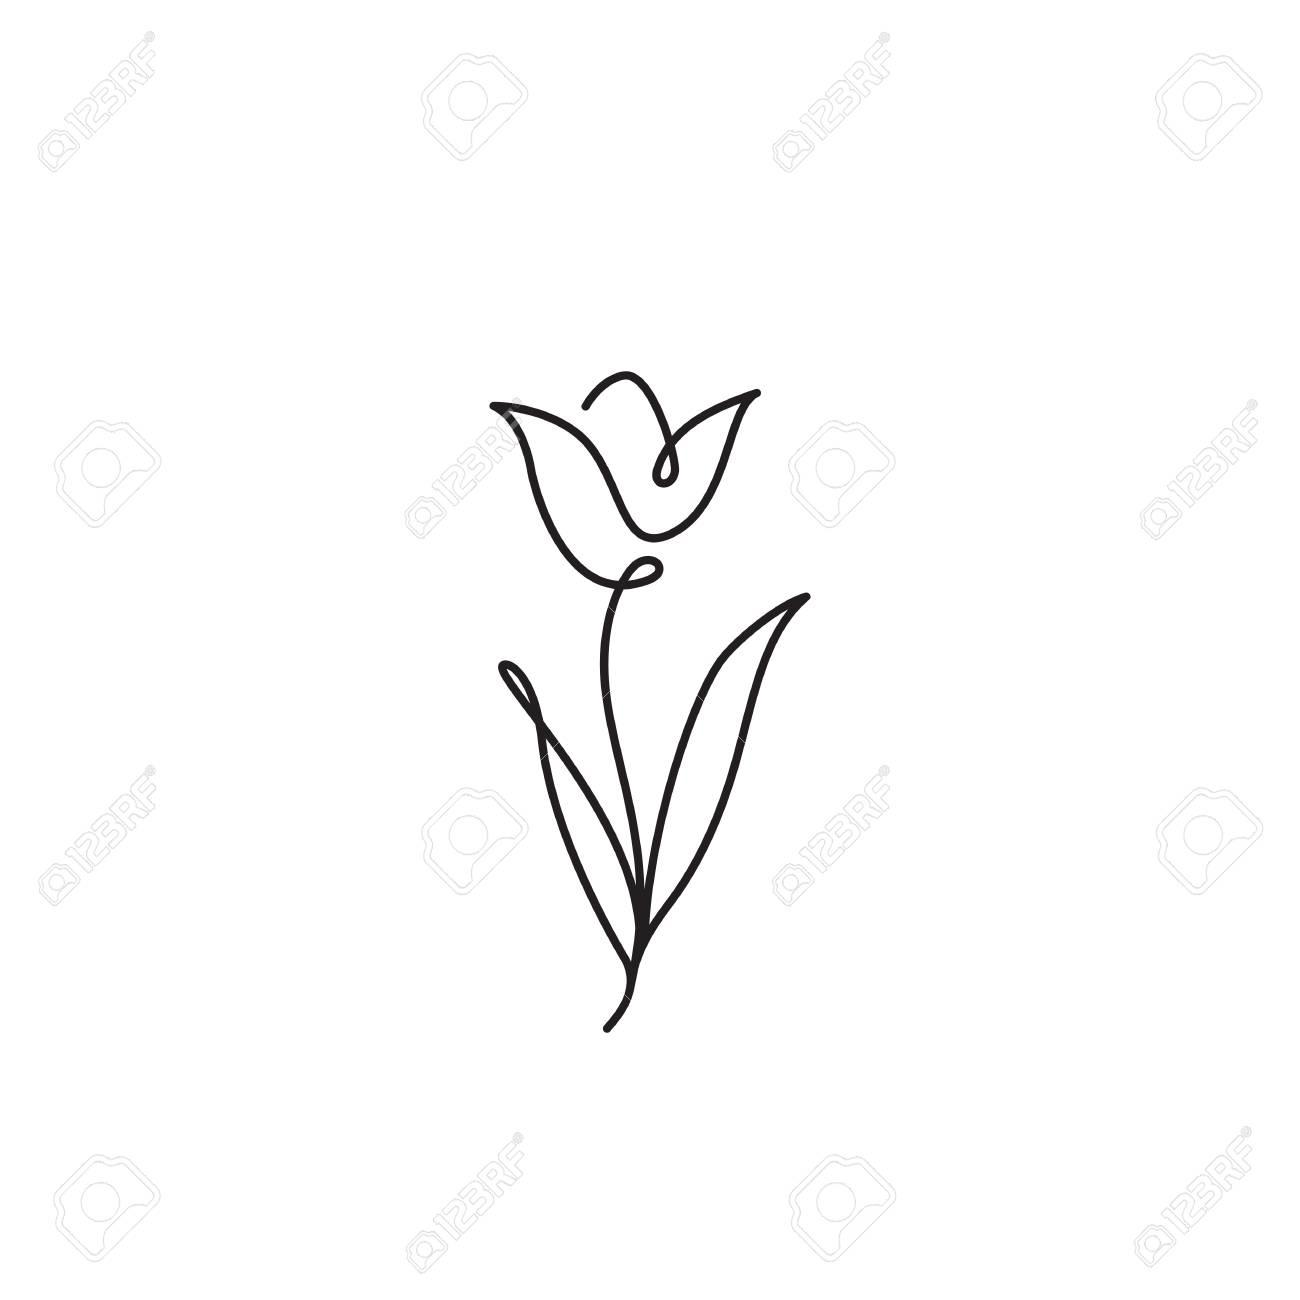 Tulip Flower Line Art Minimalist Contour Drawing One Line